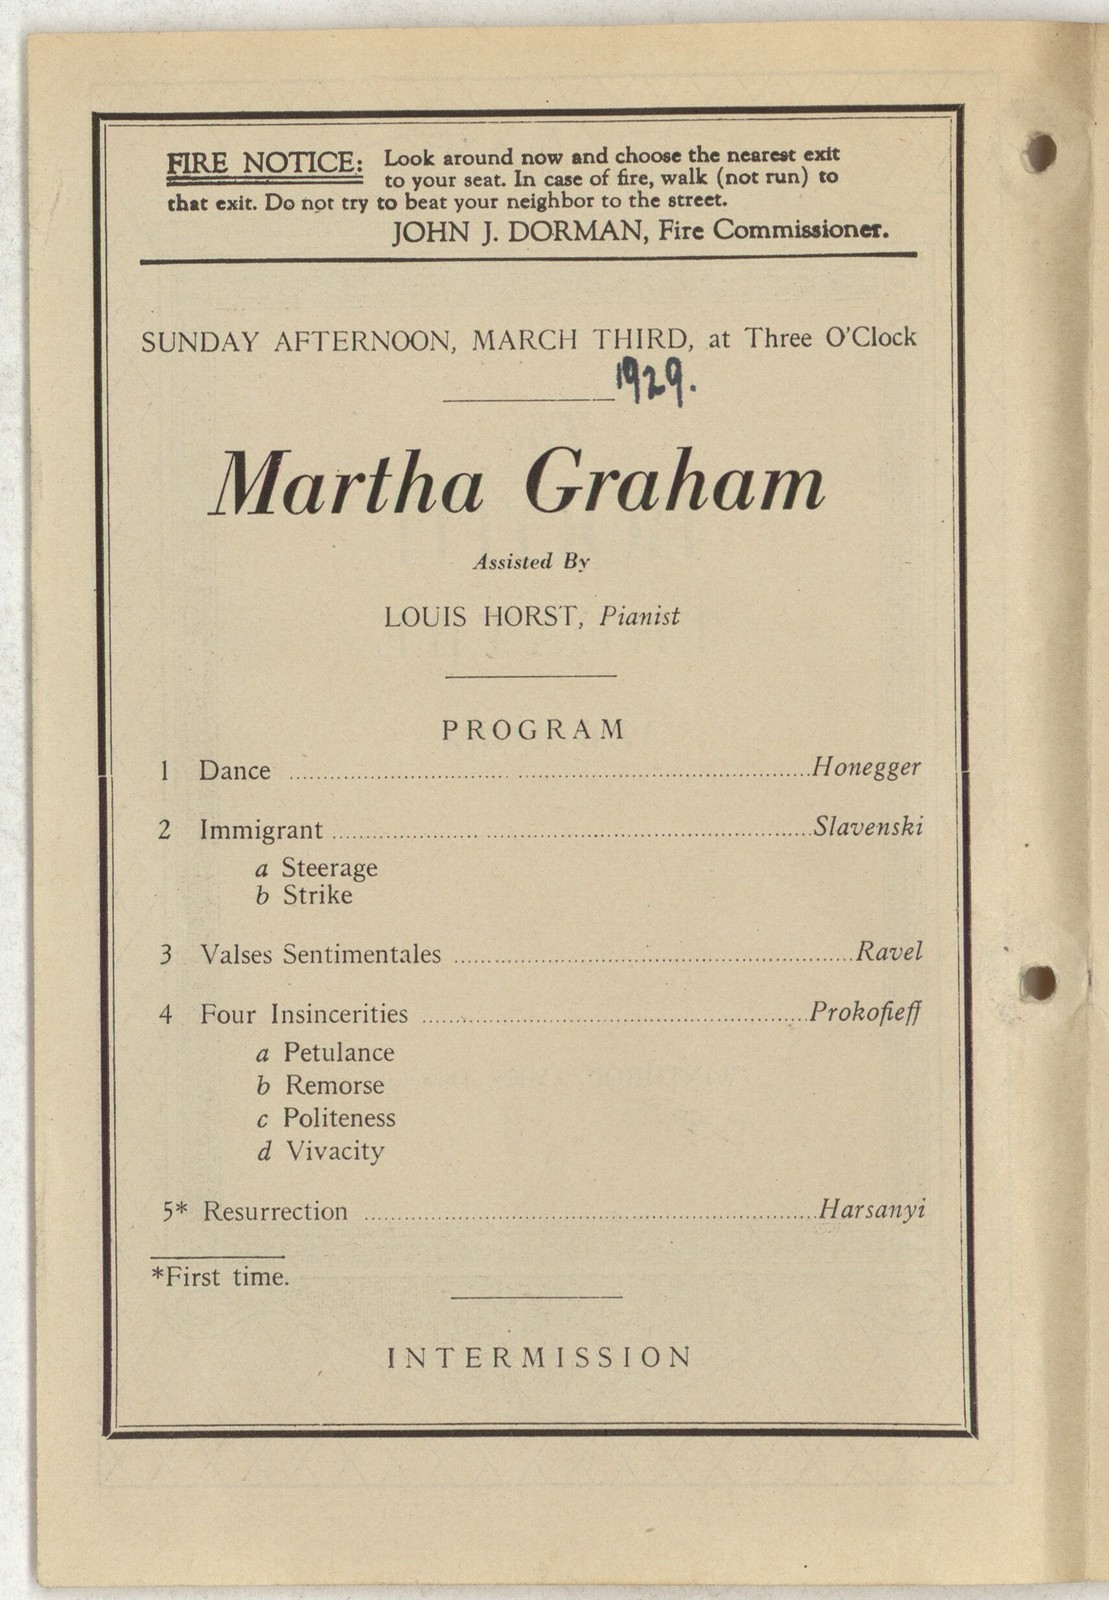 [ Martha Graham, Booth Theatre, March 3, 1929]